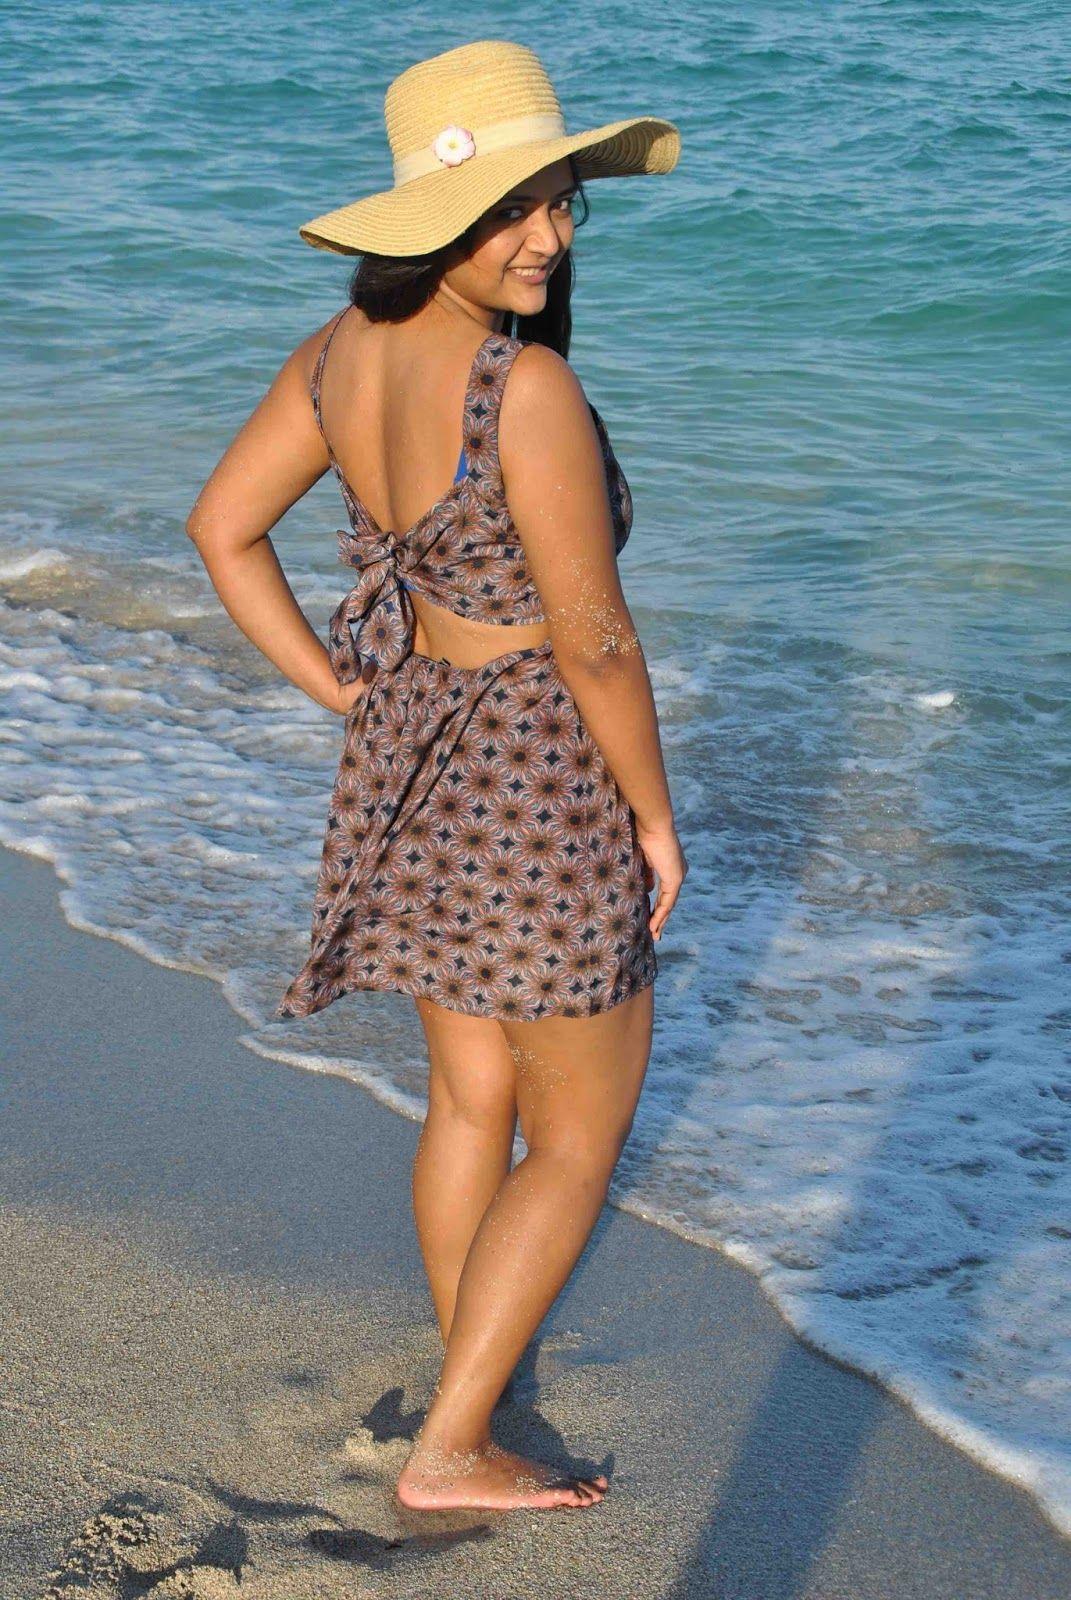 Image result for indian girl in open back dresses